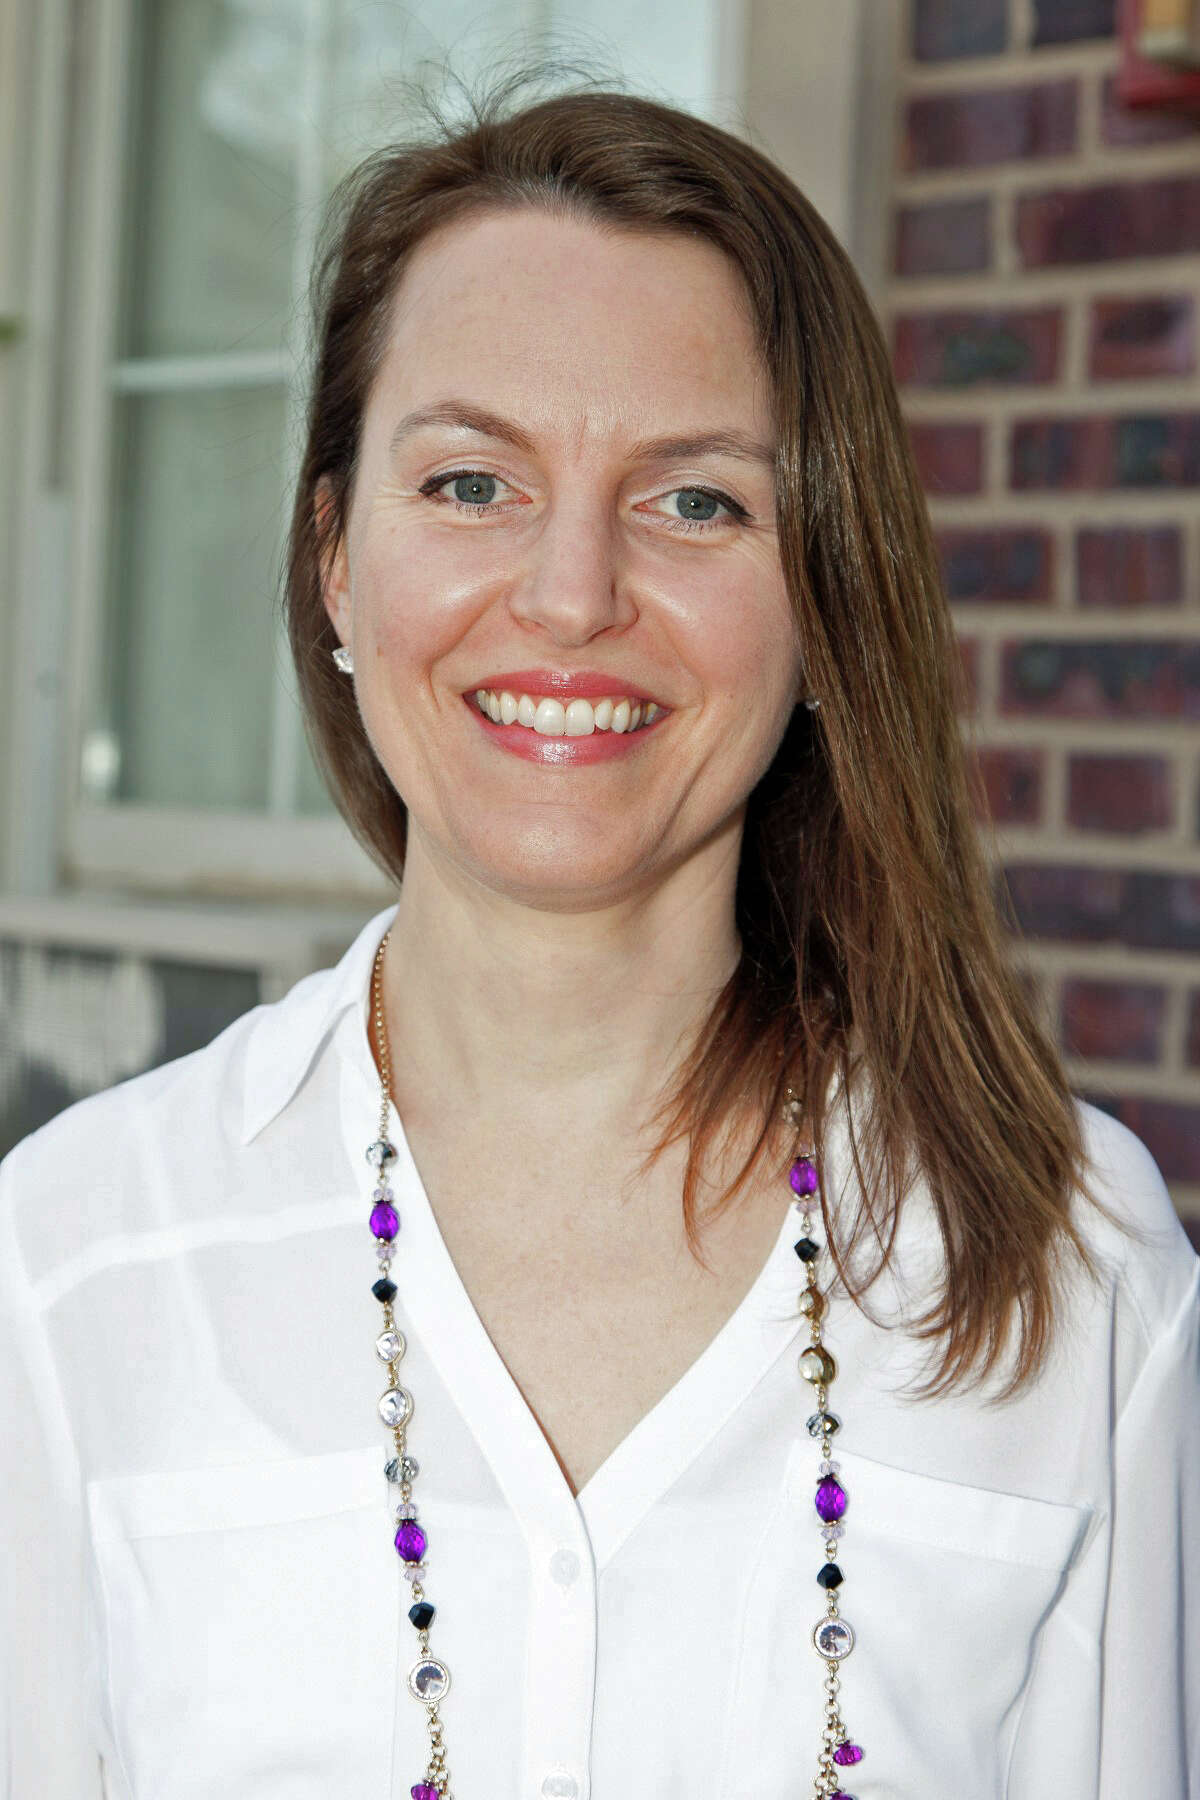 Greenwich High School science teacher Sarah Goldin is a semi-finalist for the 2017 CT Teacher of the Year award.